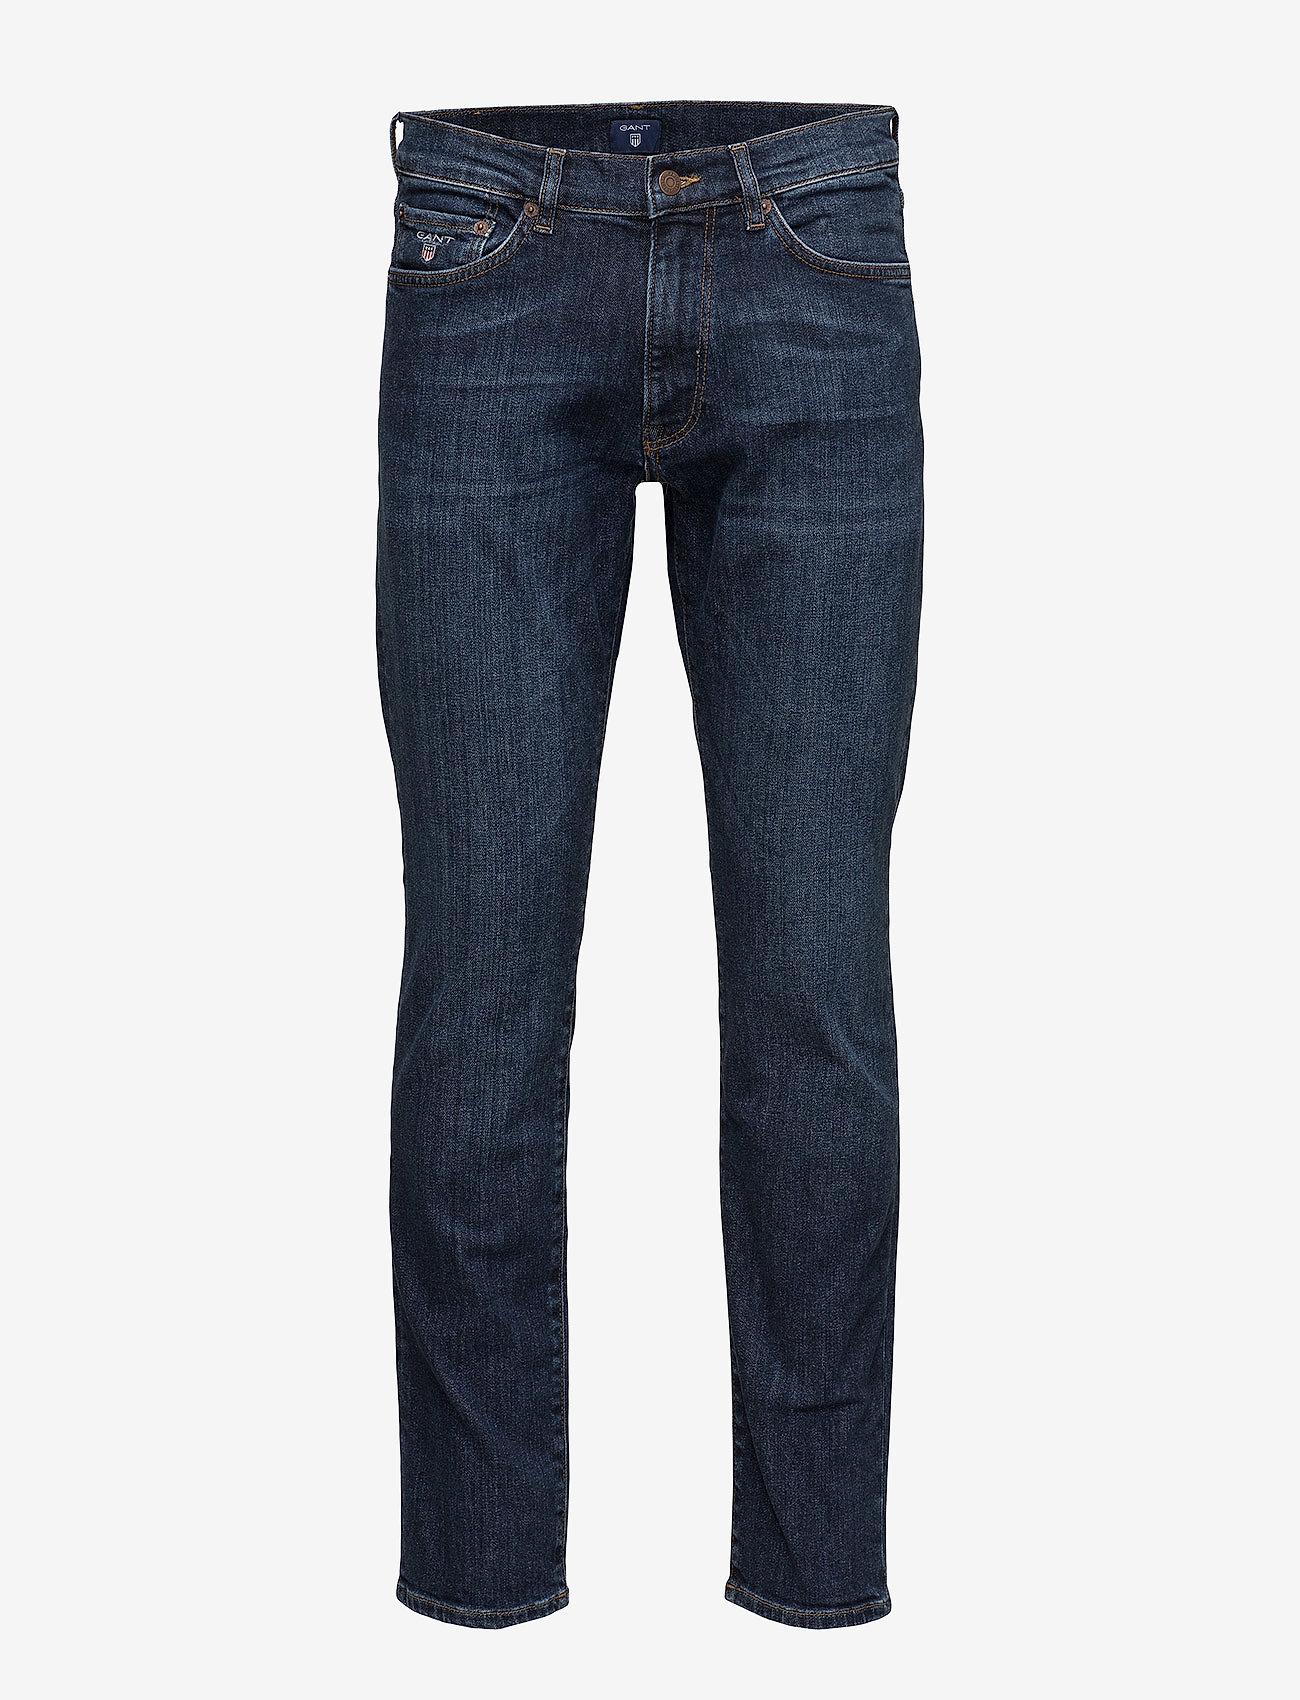 GANT - SLIM GANT JEANS - slim jeans - dark blue worn in - 0